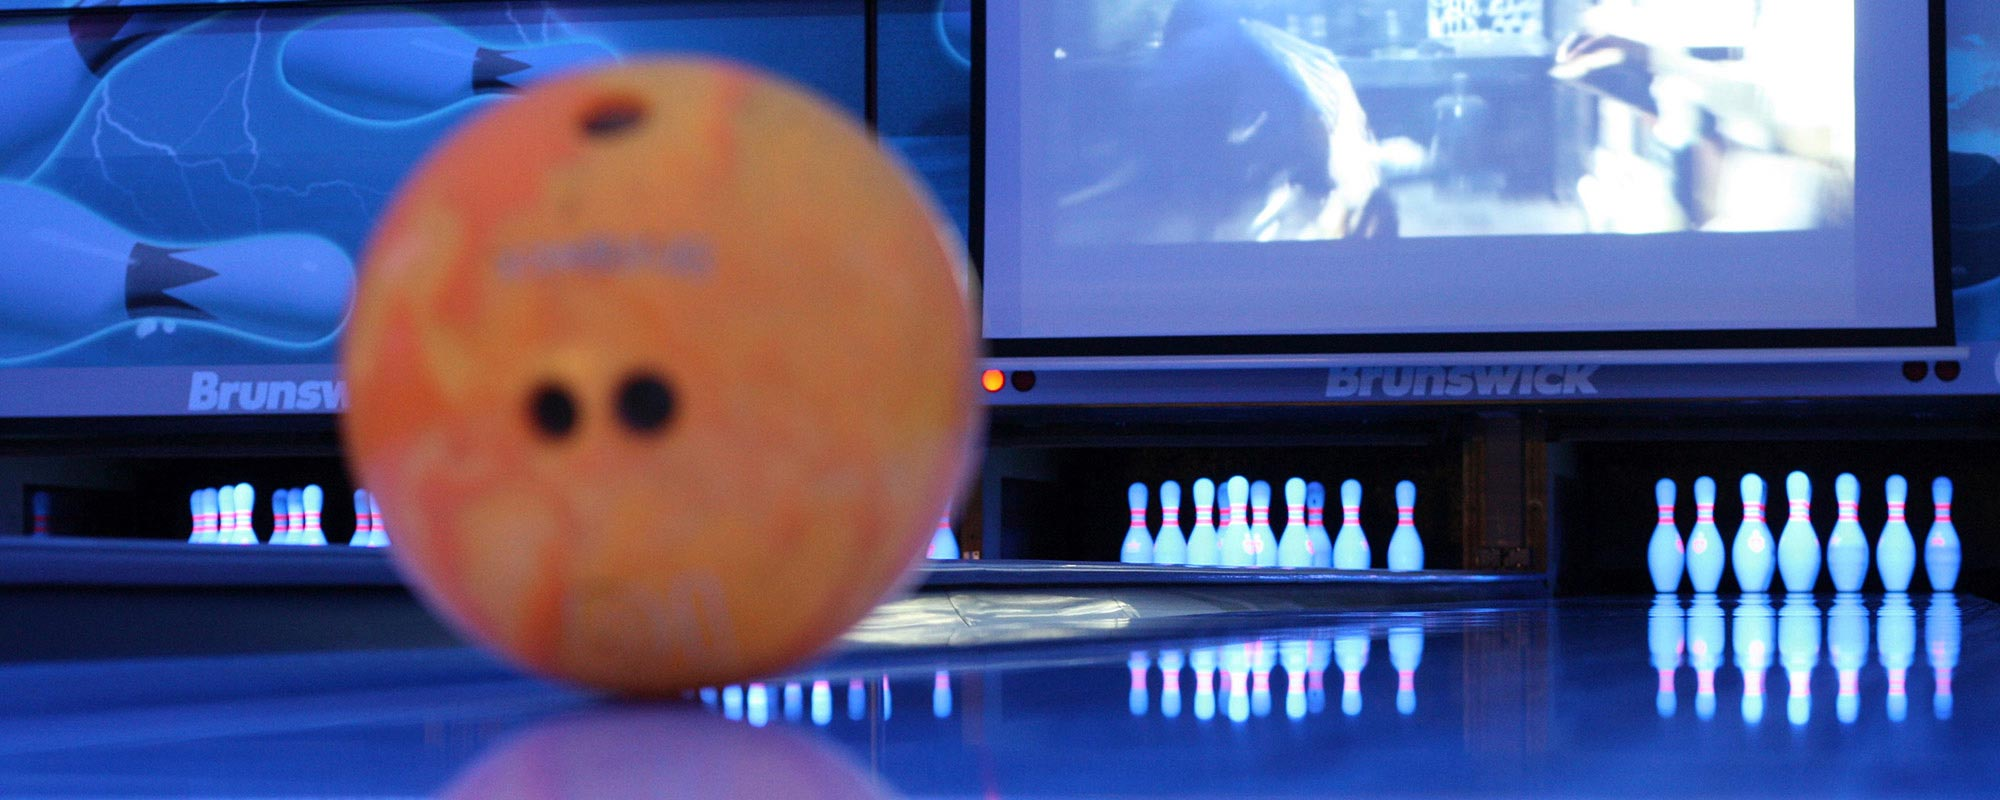 ebafkc-bowling-2000x800-06